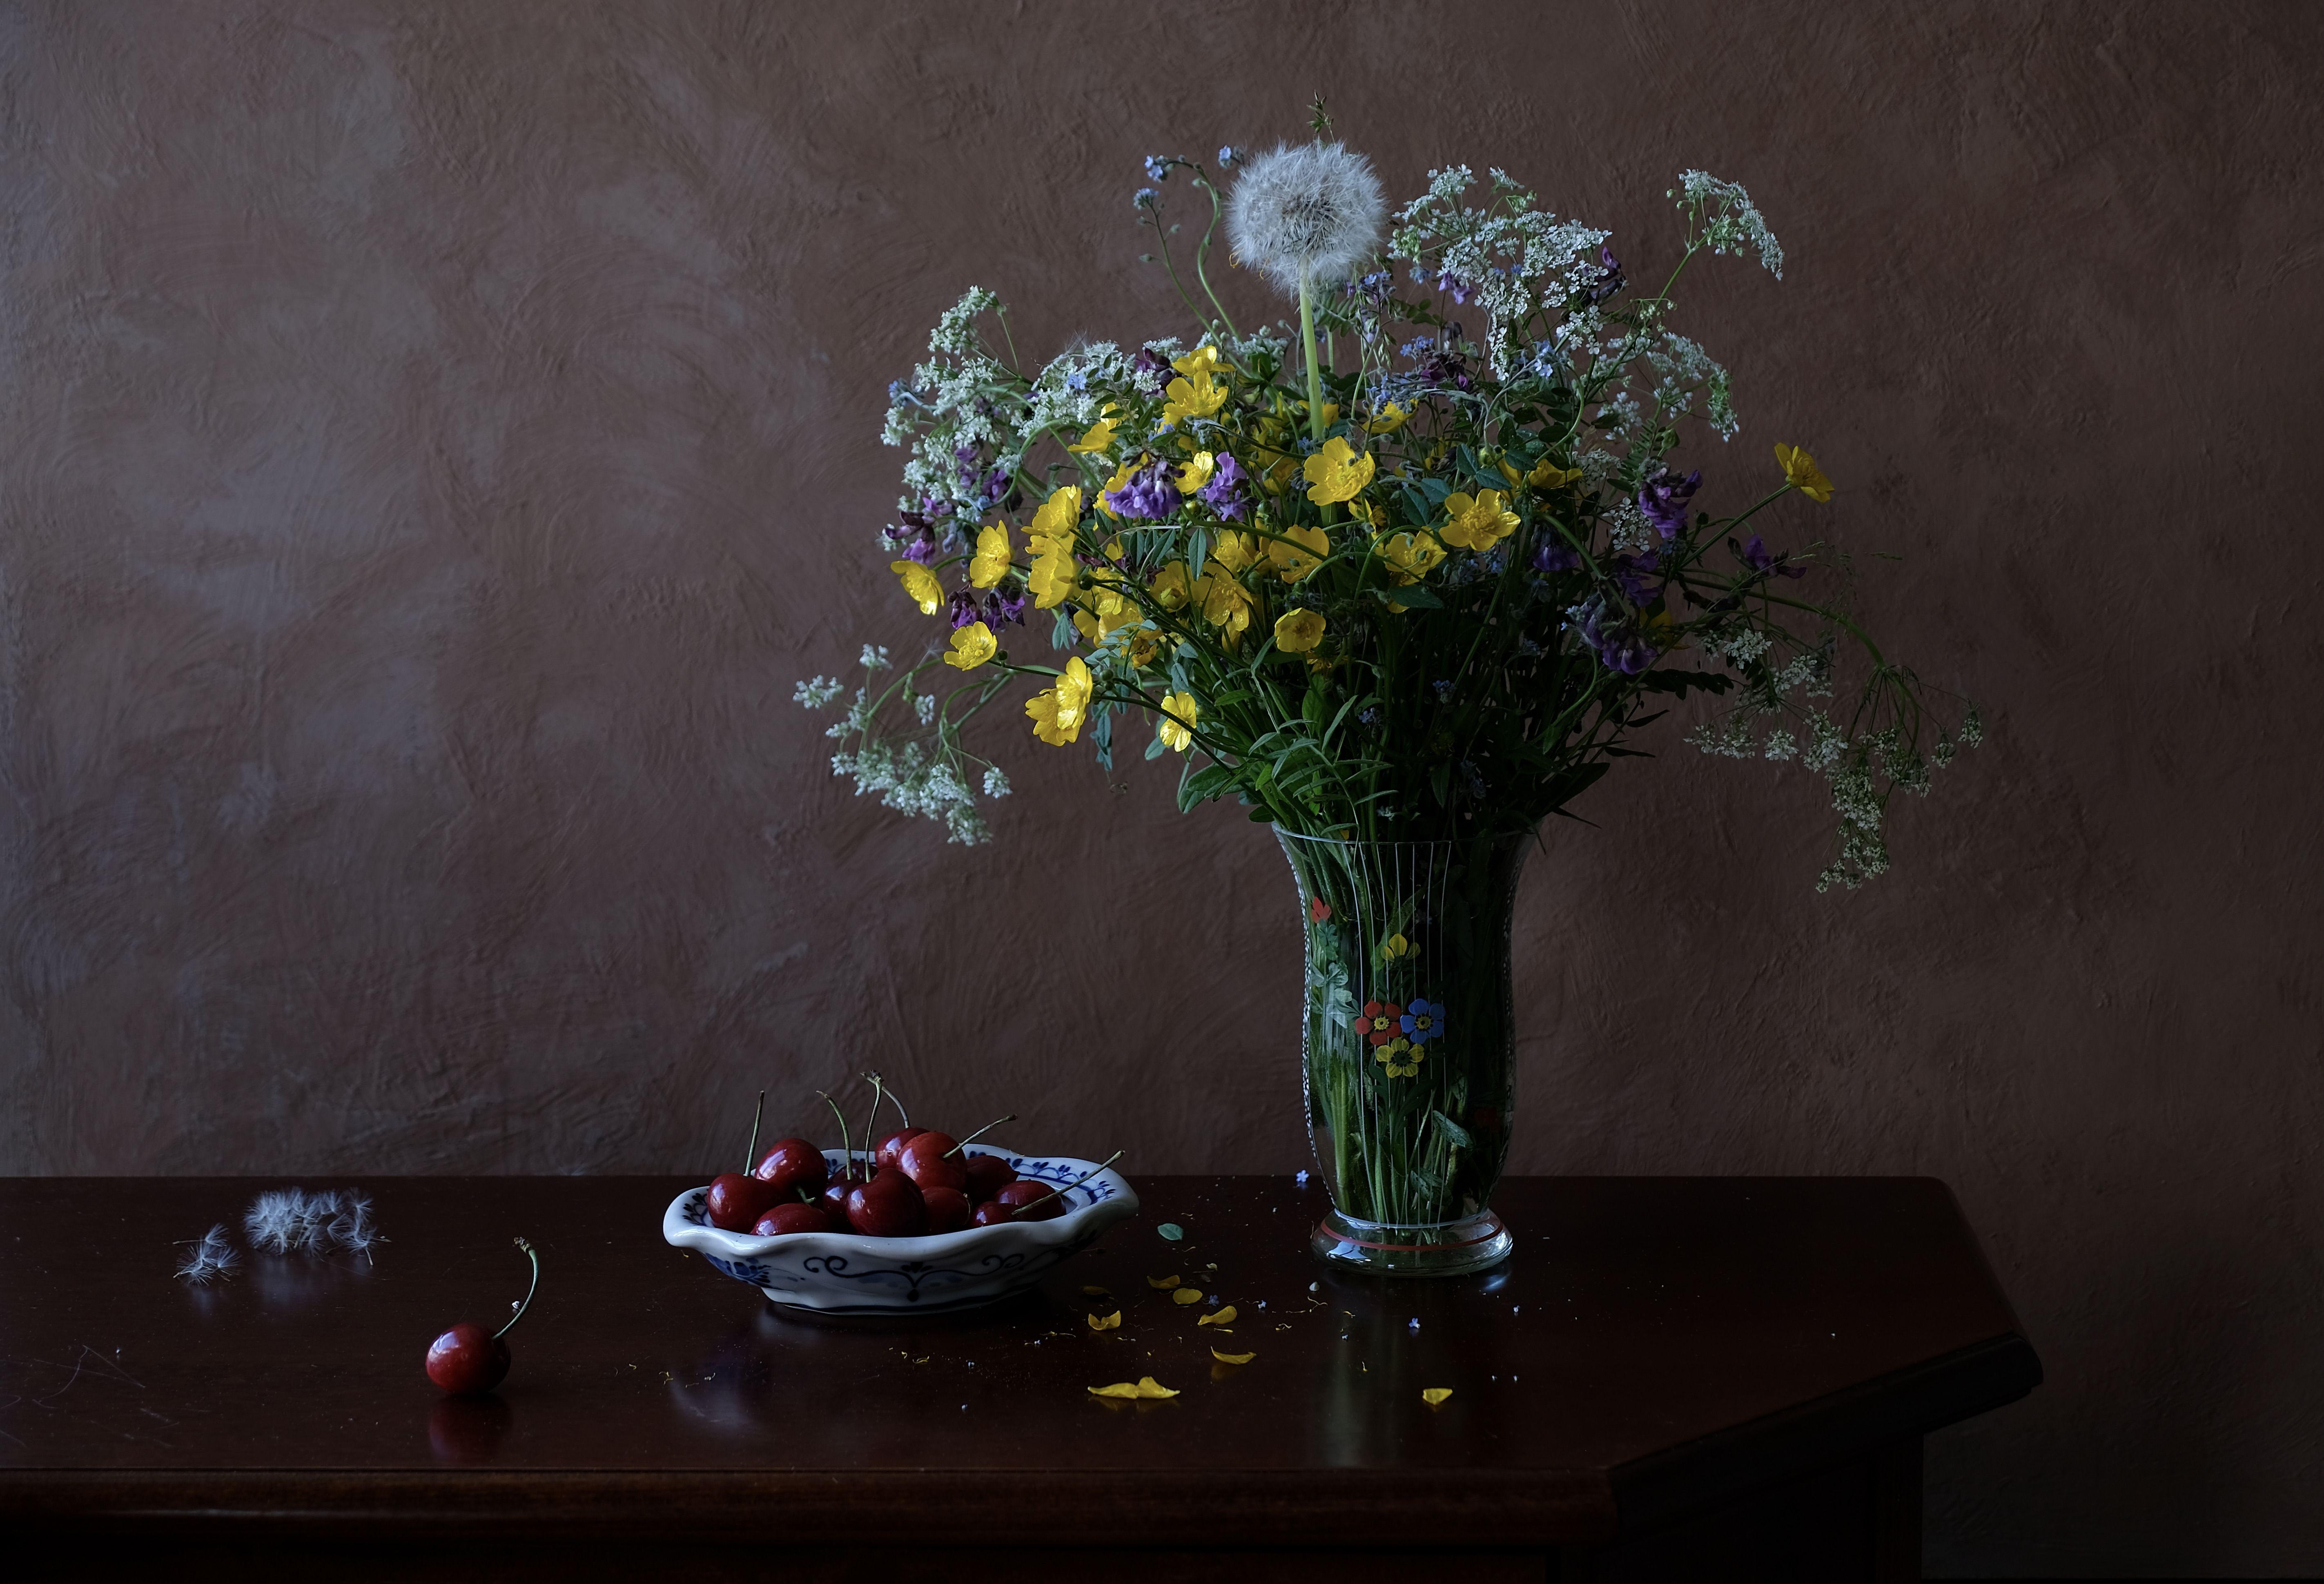 Still life, flowers, flora, colors, nature, Norway, fruit, food, summer, sweet cherry, dandelion, wildflowers, , Povarova Ree Svetlana